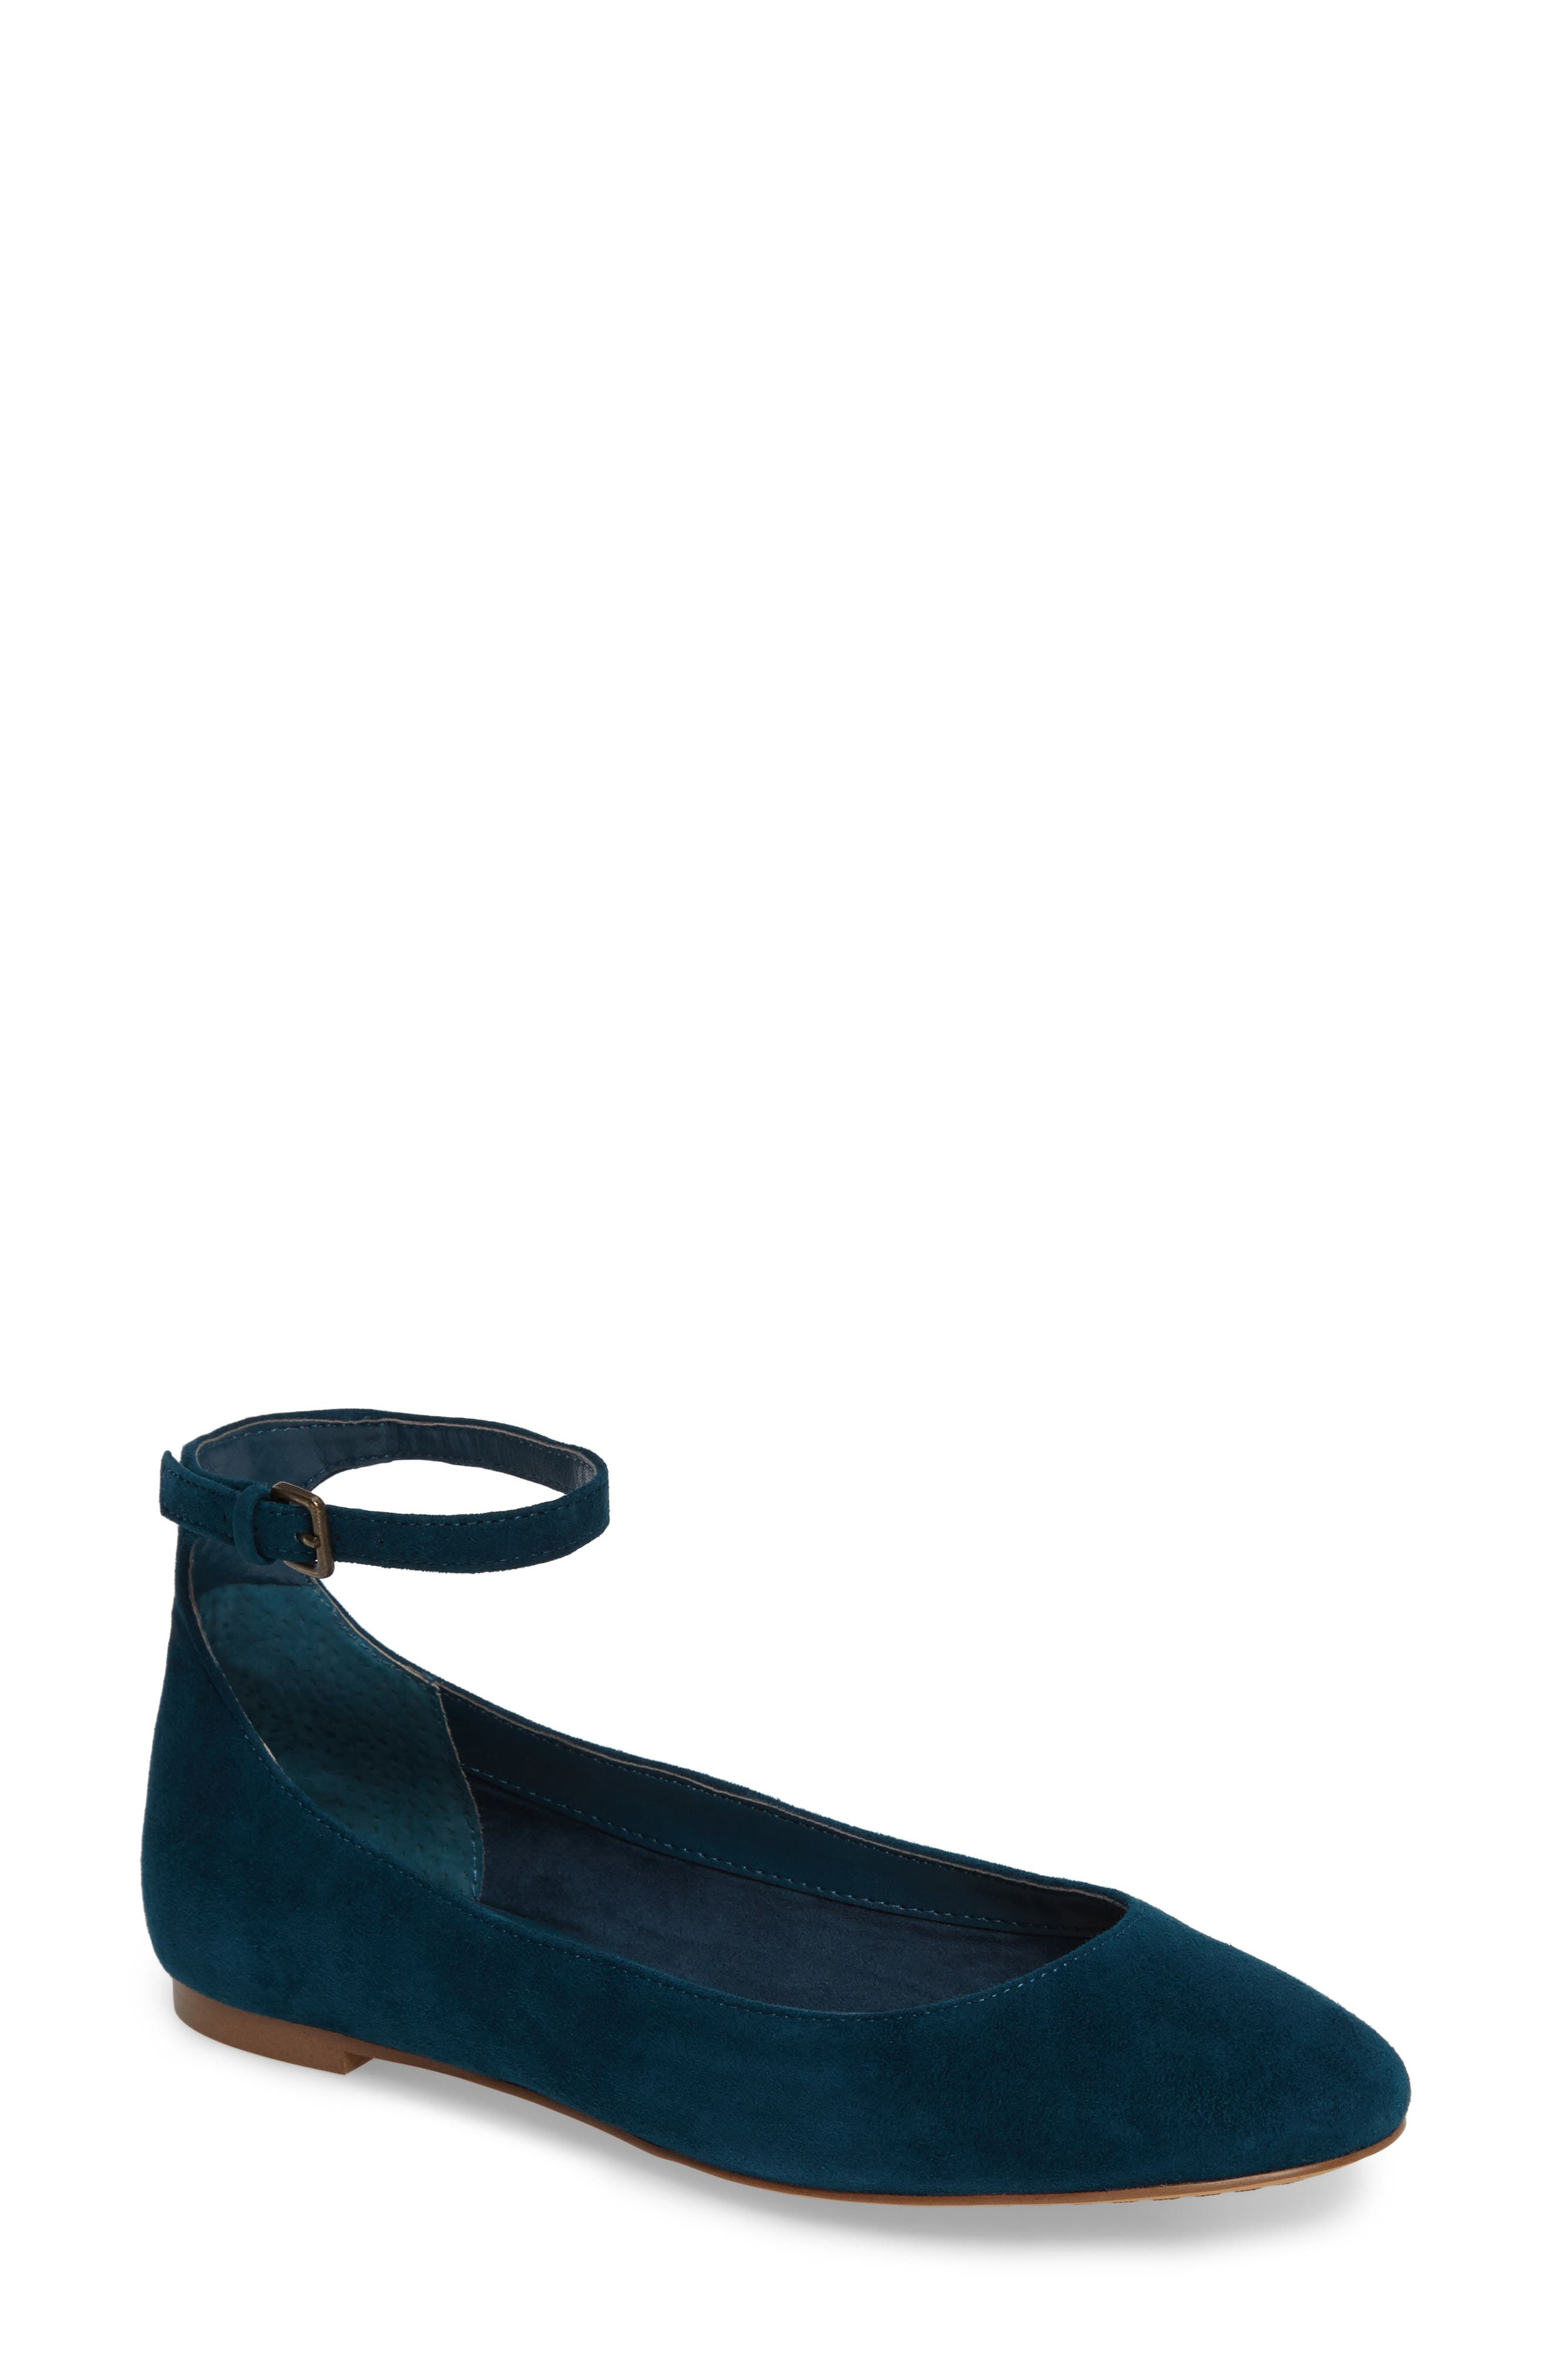 Main Image - Treasure & Bond Jules Ankle Strap Ballet Flat (Women)